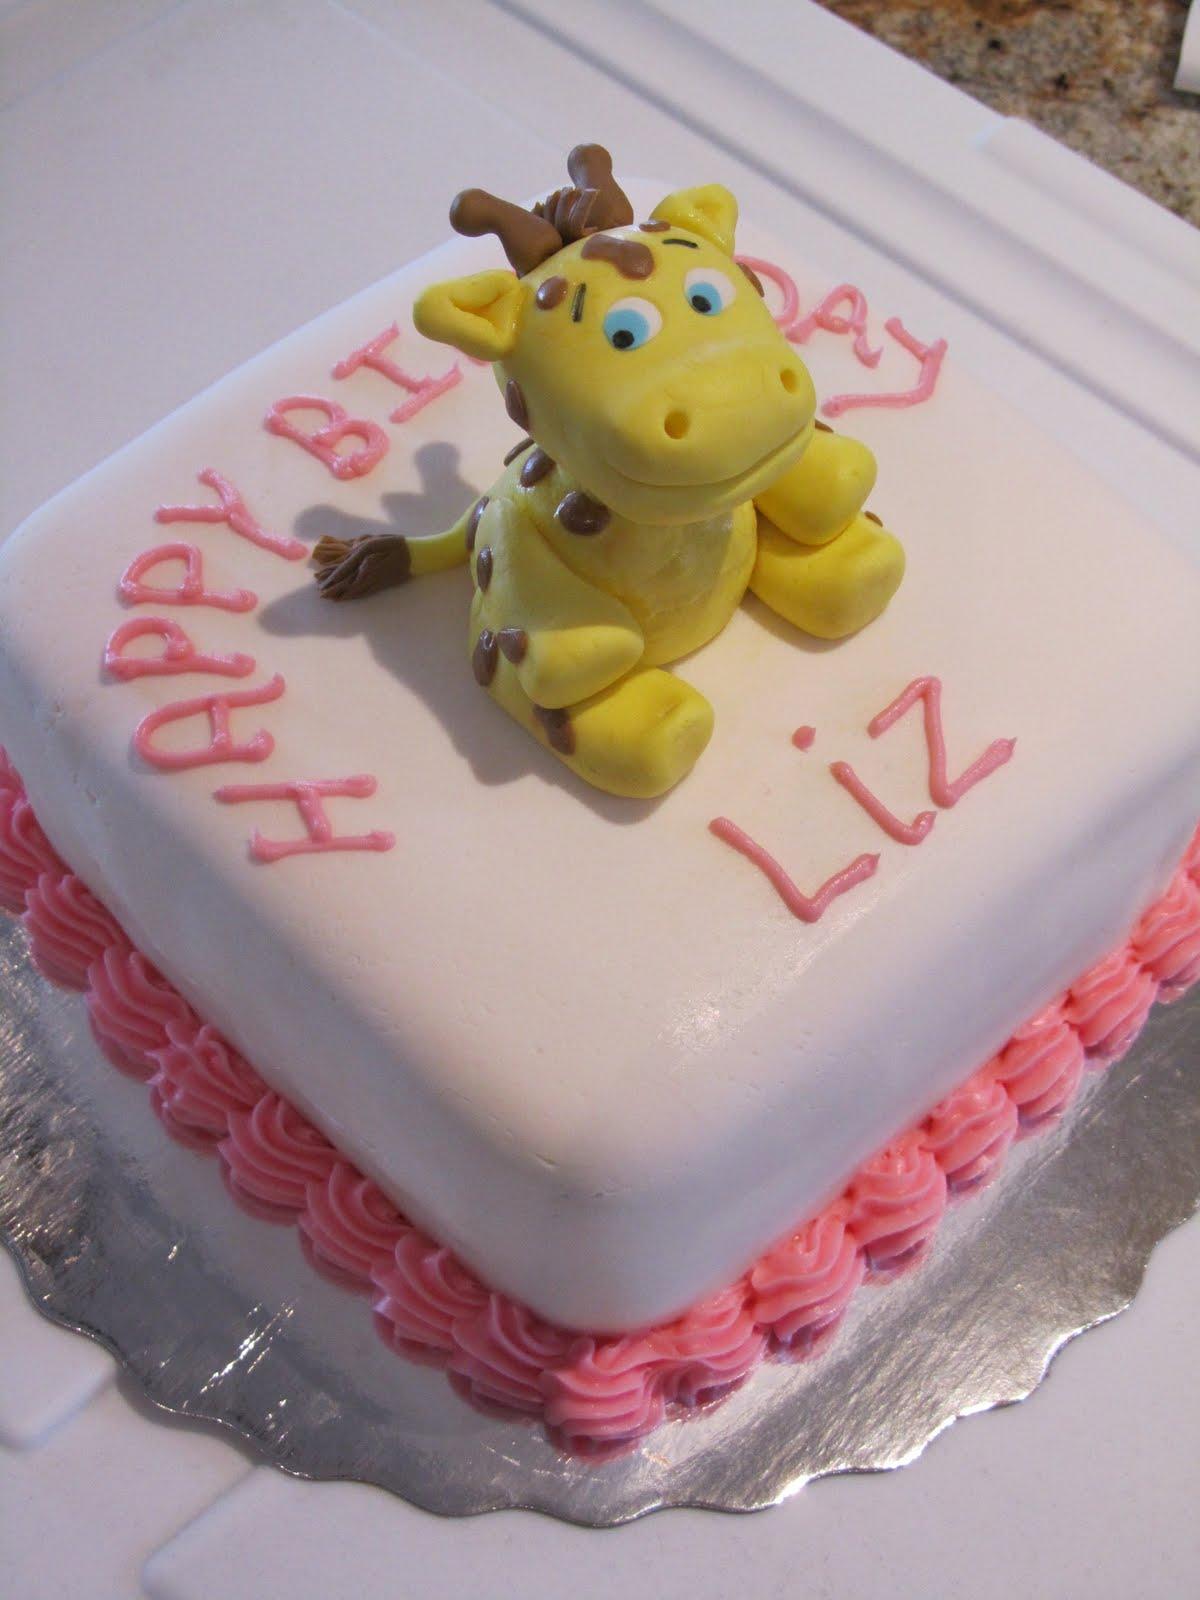 Extraordinary Winn Dixie Wedding Cakes Concept Bruman Mmc Birthday At 28 Images